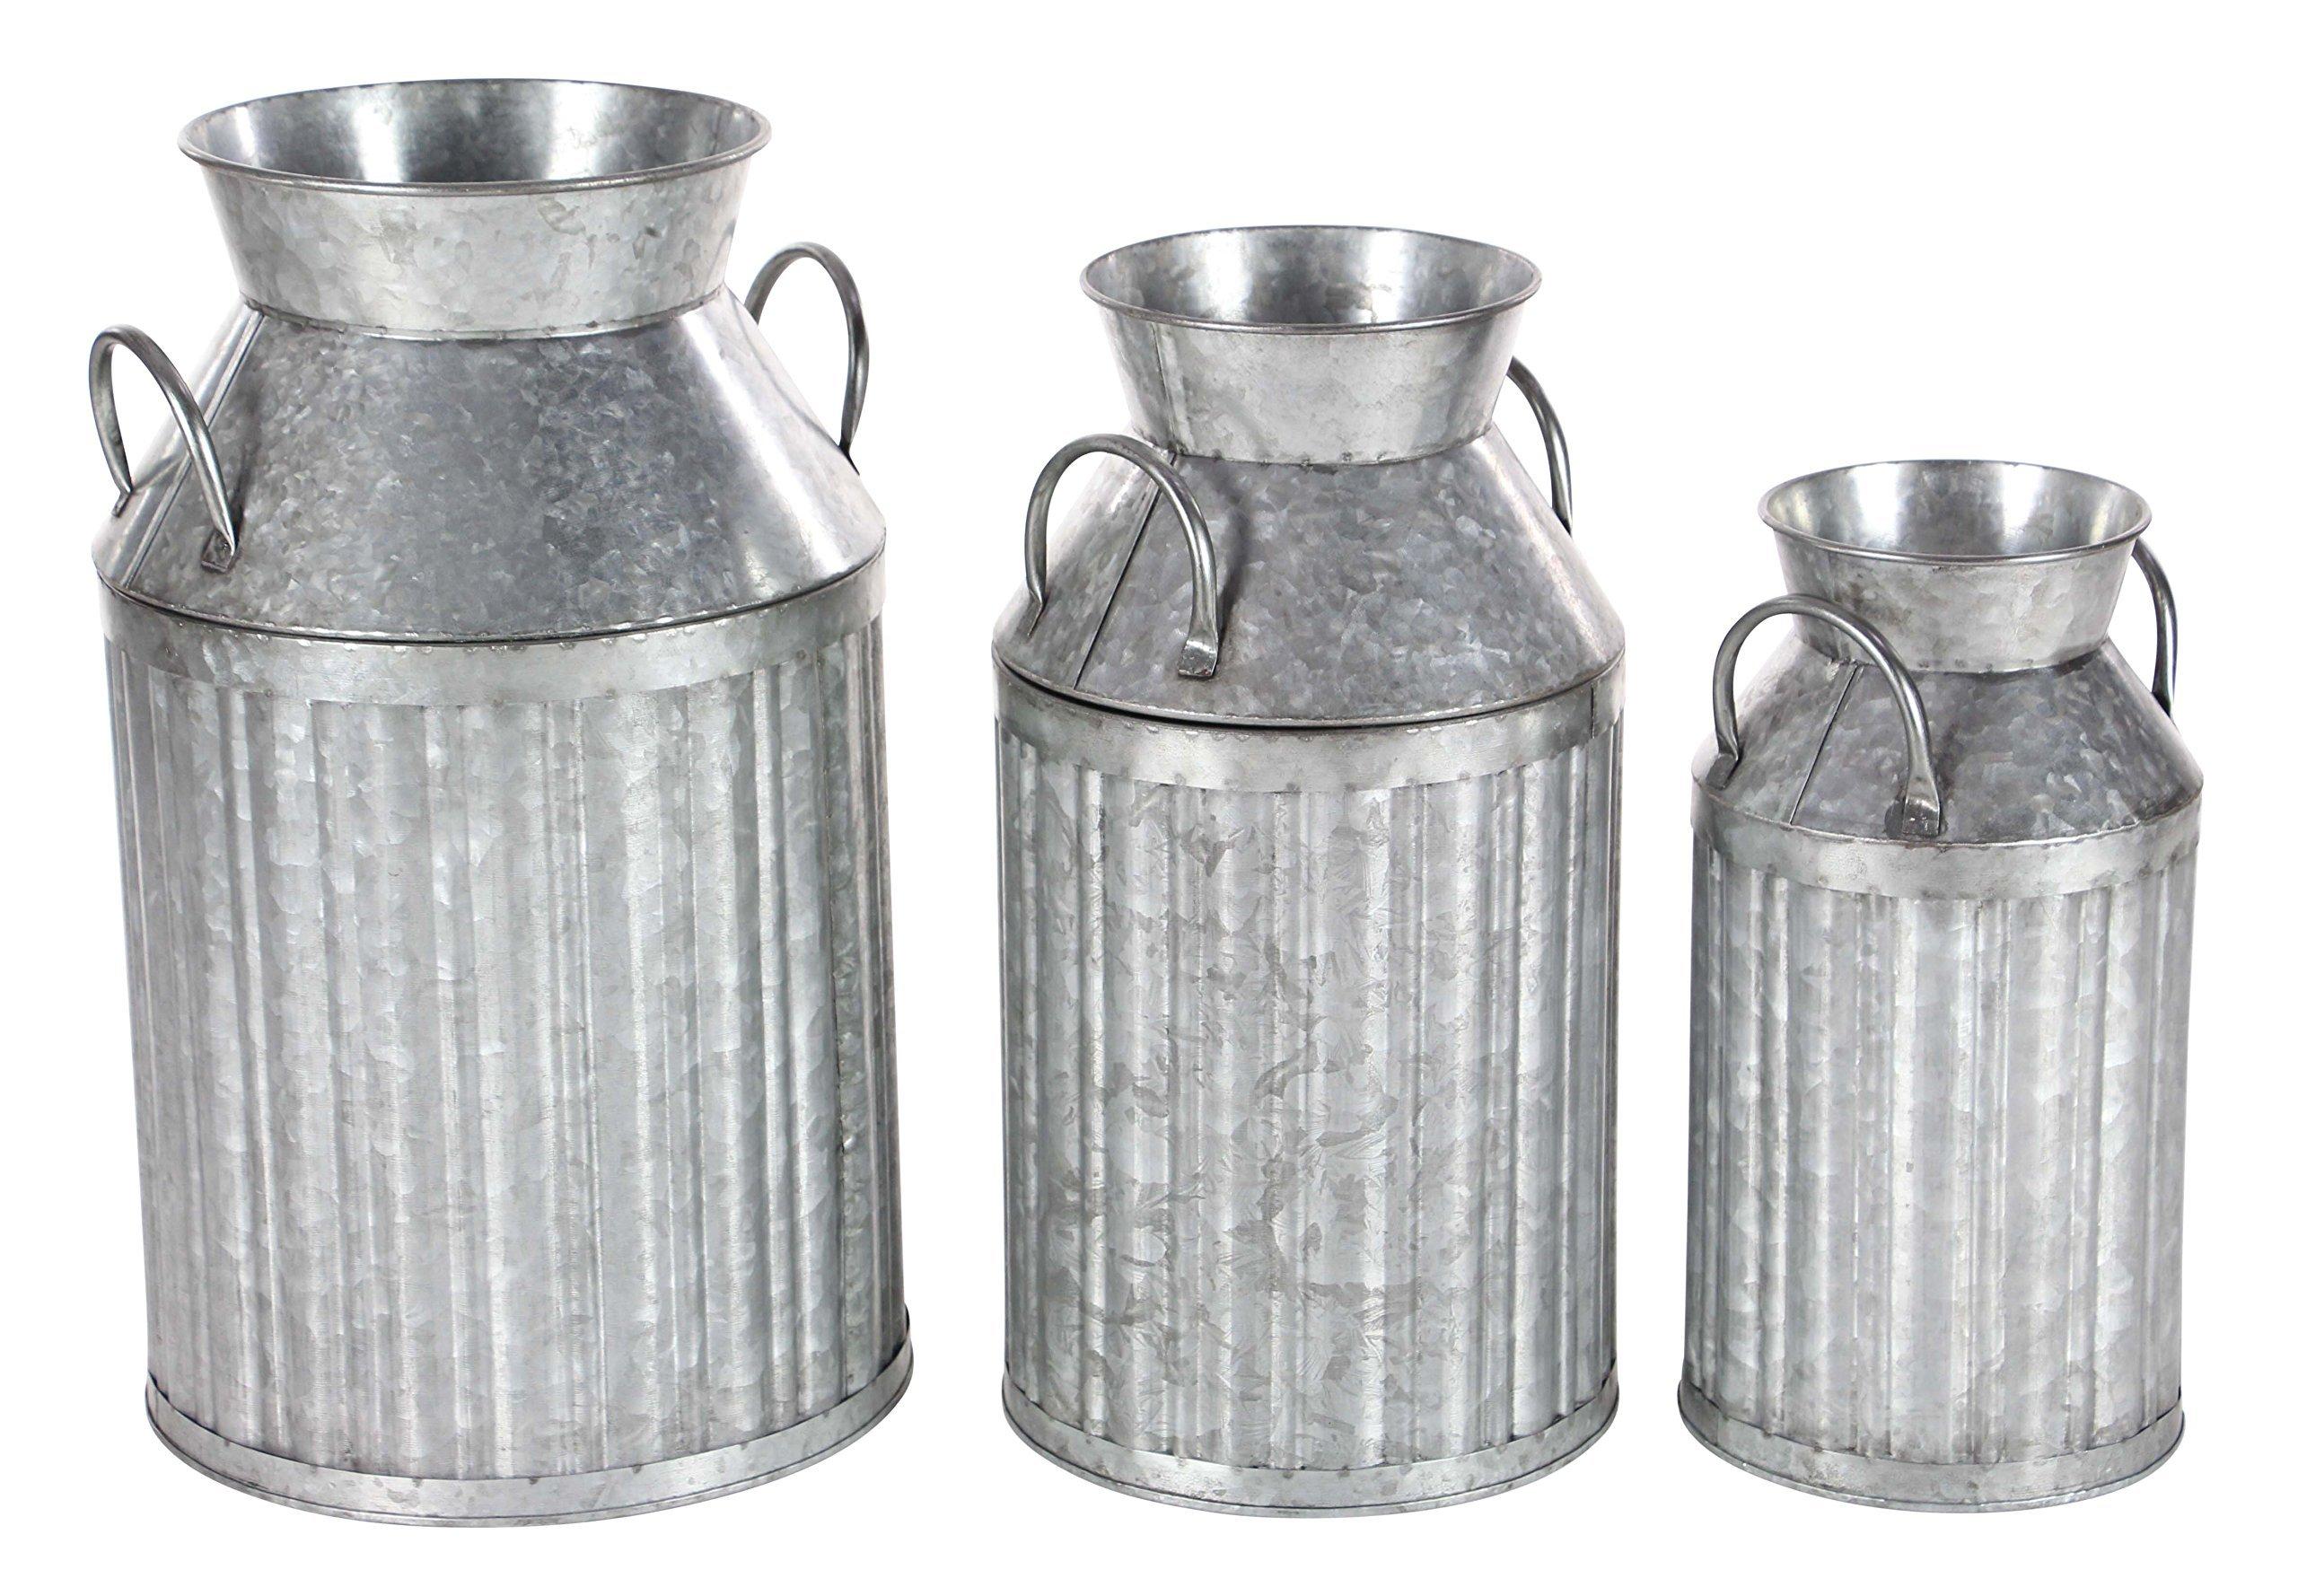 Deco 79 98145 Iron Milk Jugs (Set of 3) 13'' x 17'' x 19'' Gray by Deco 79